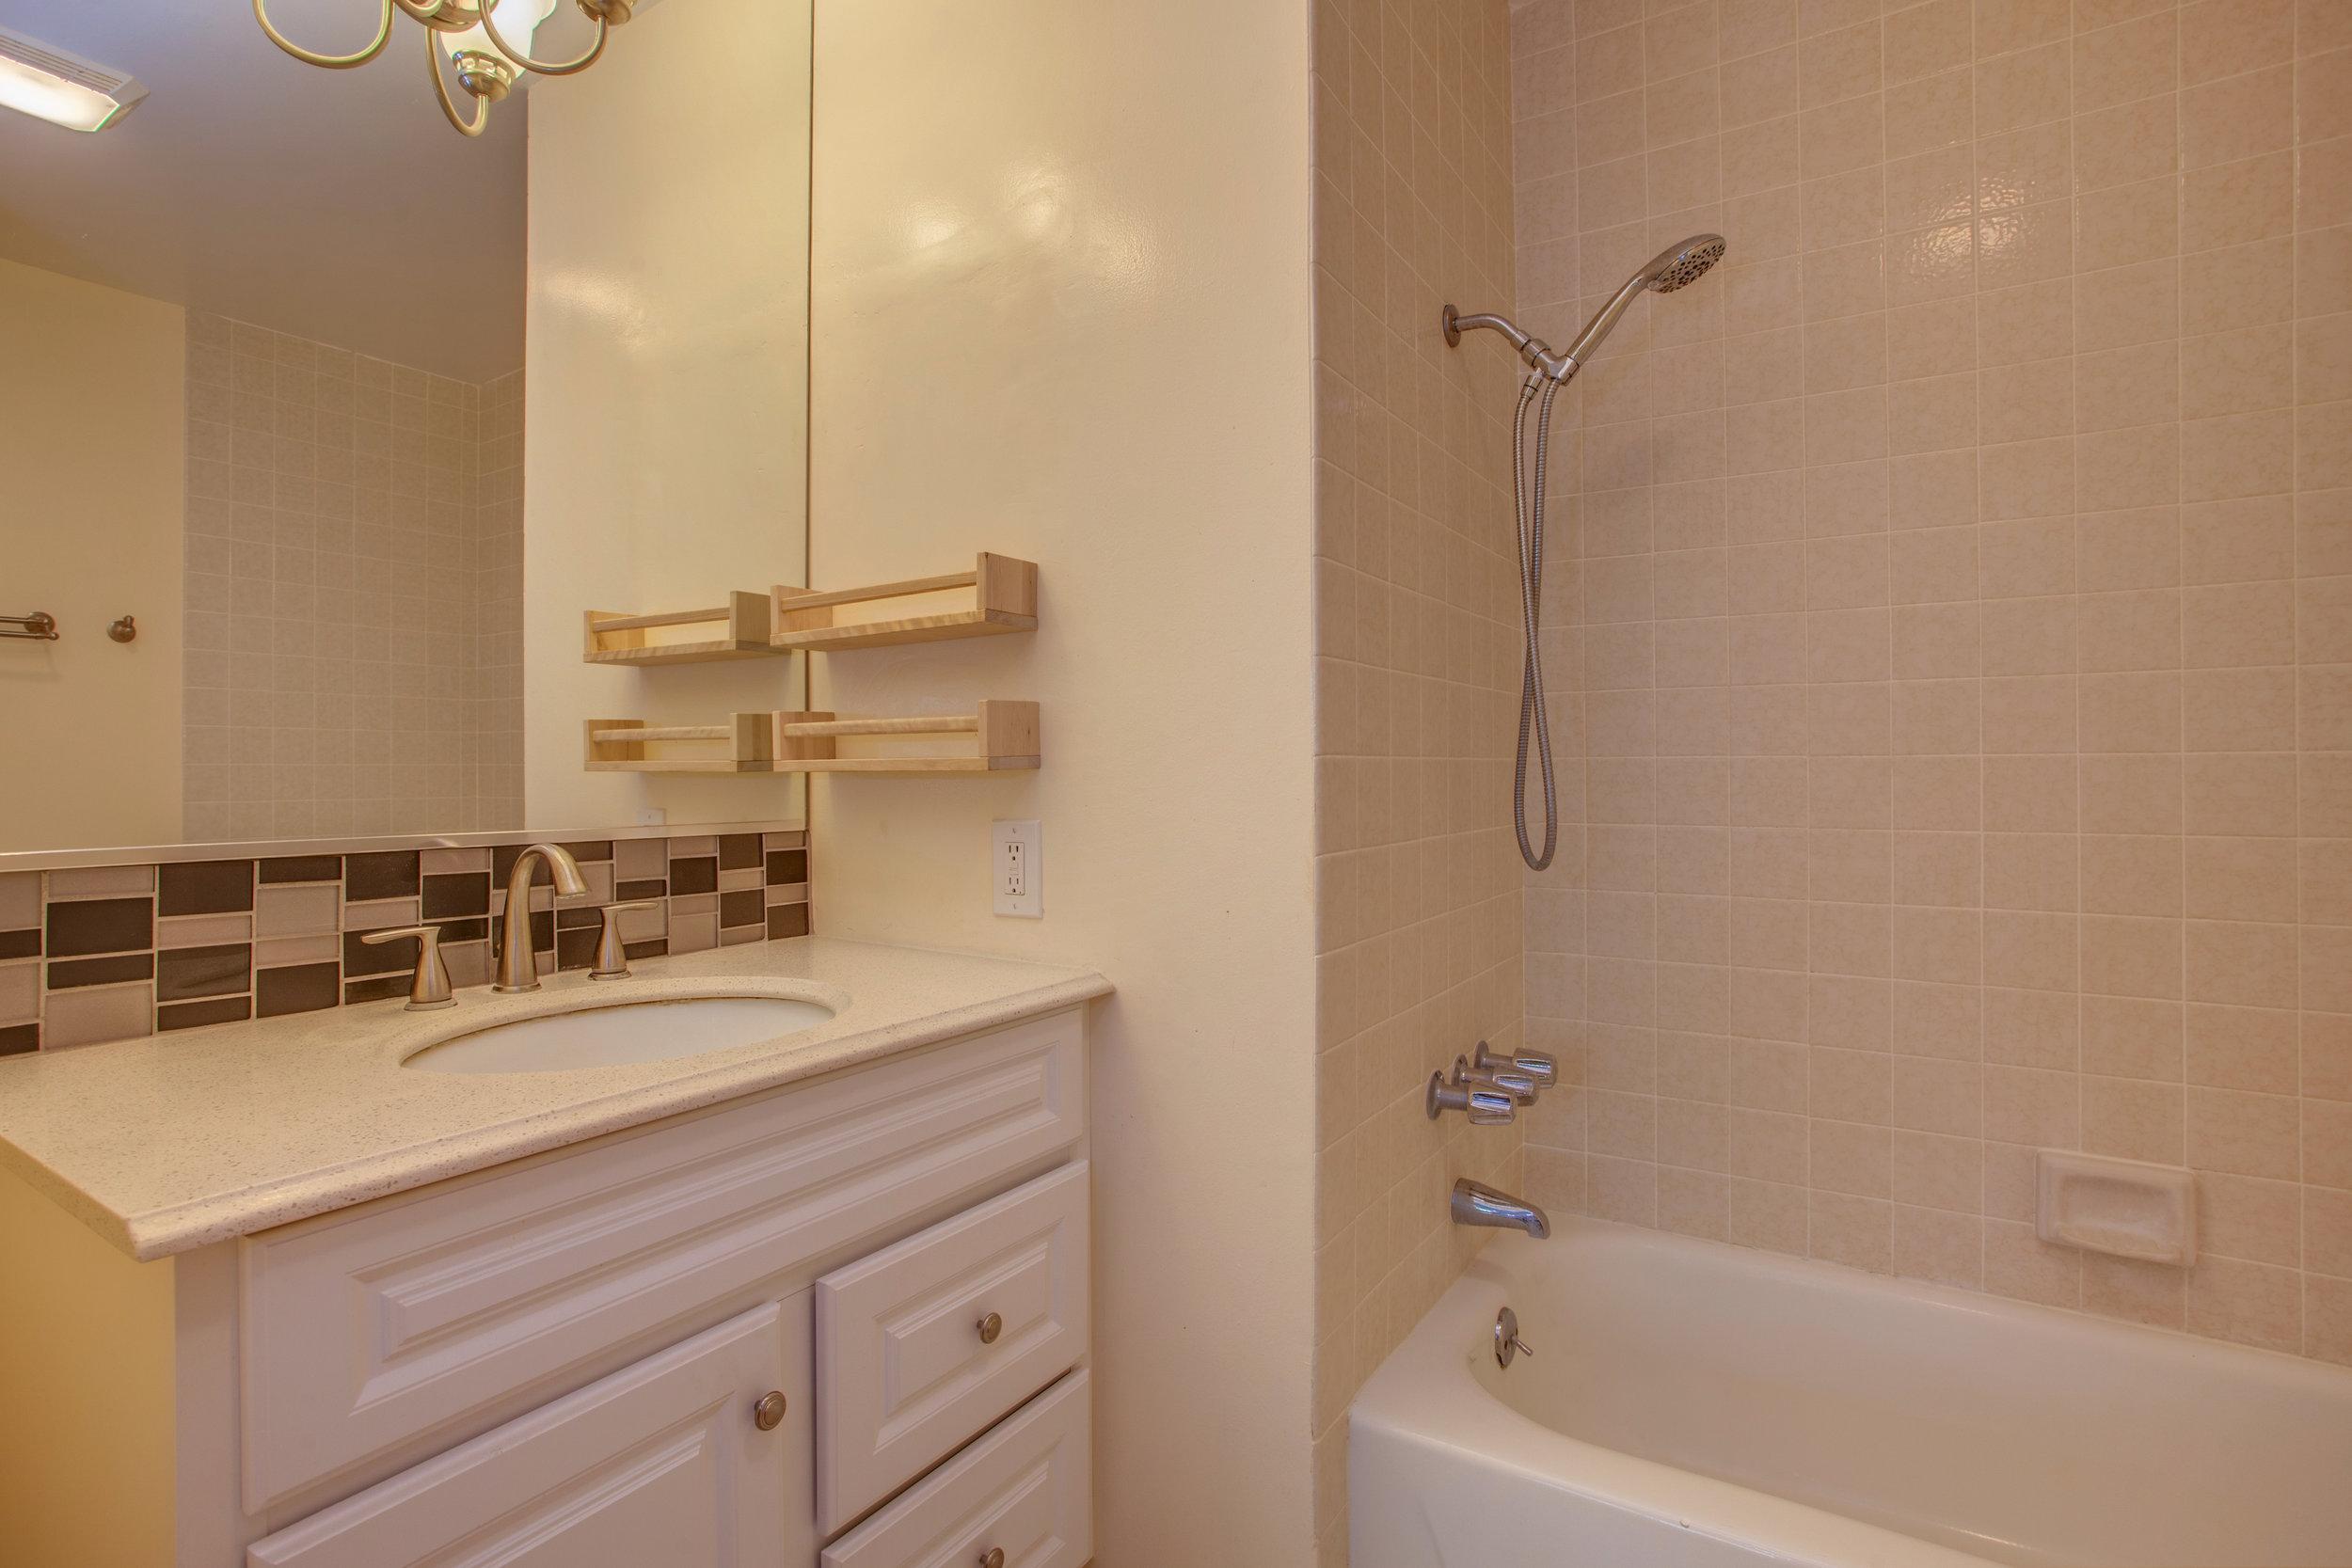 2040_main_street_105_MLS_HID1147580_ROOMmasterbathroom.jpg